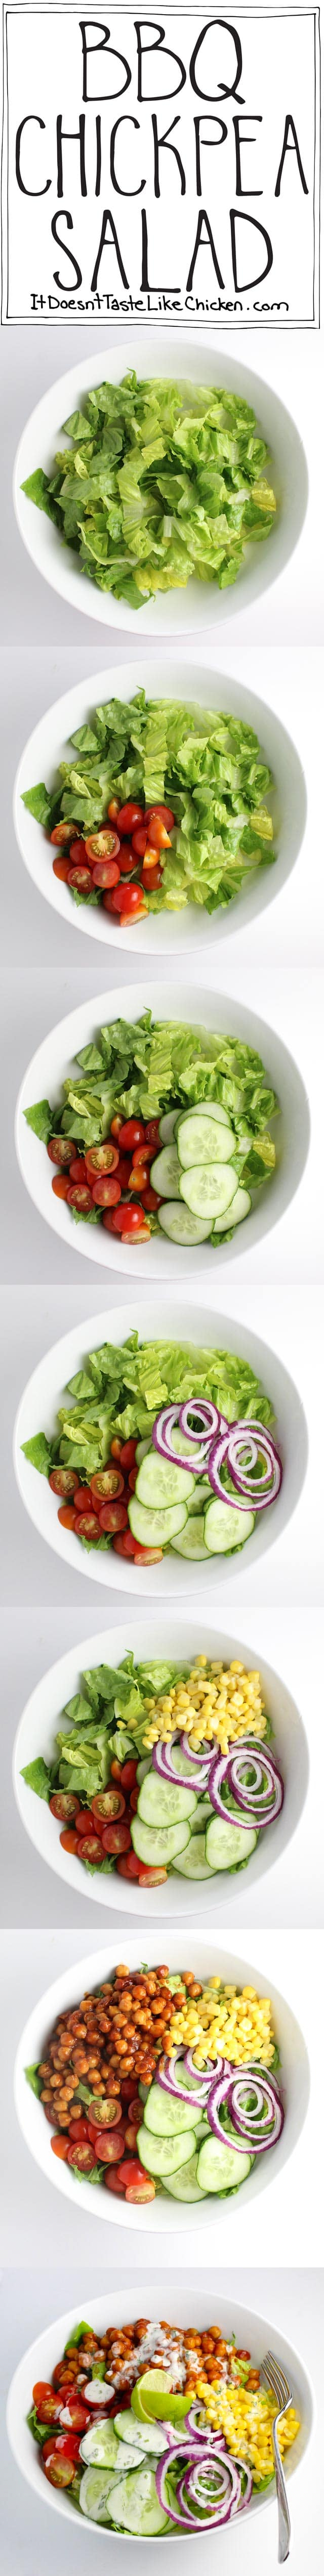 BBQ Chickpea Salad #vegan